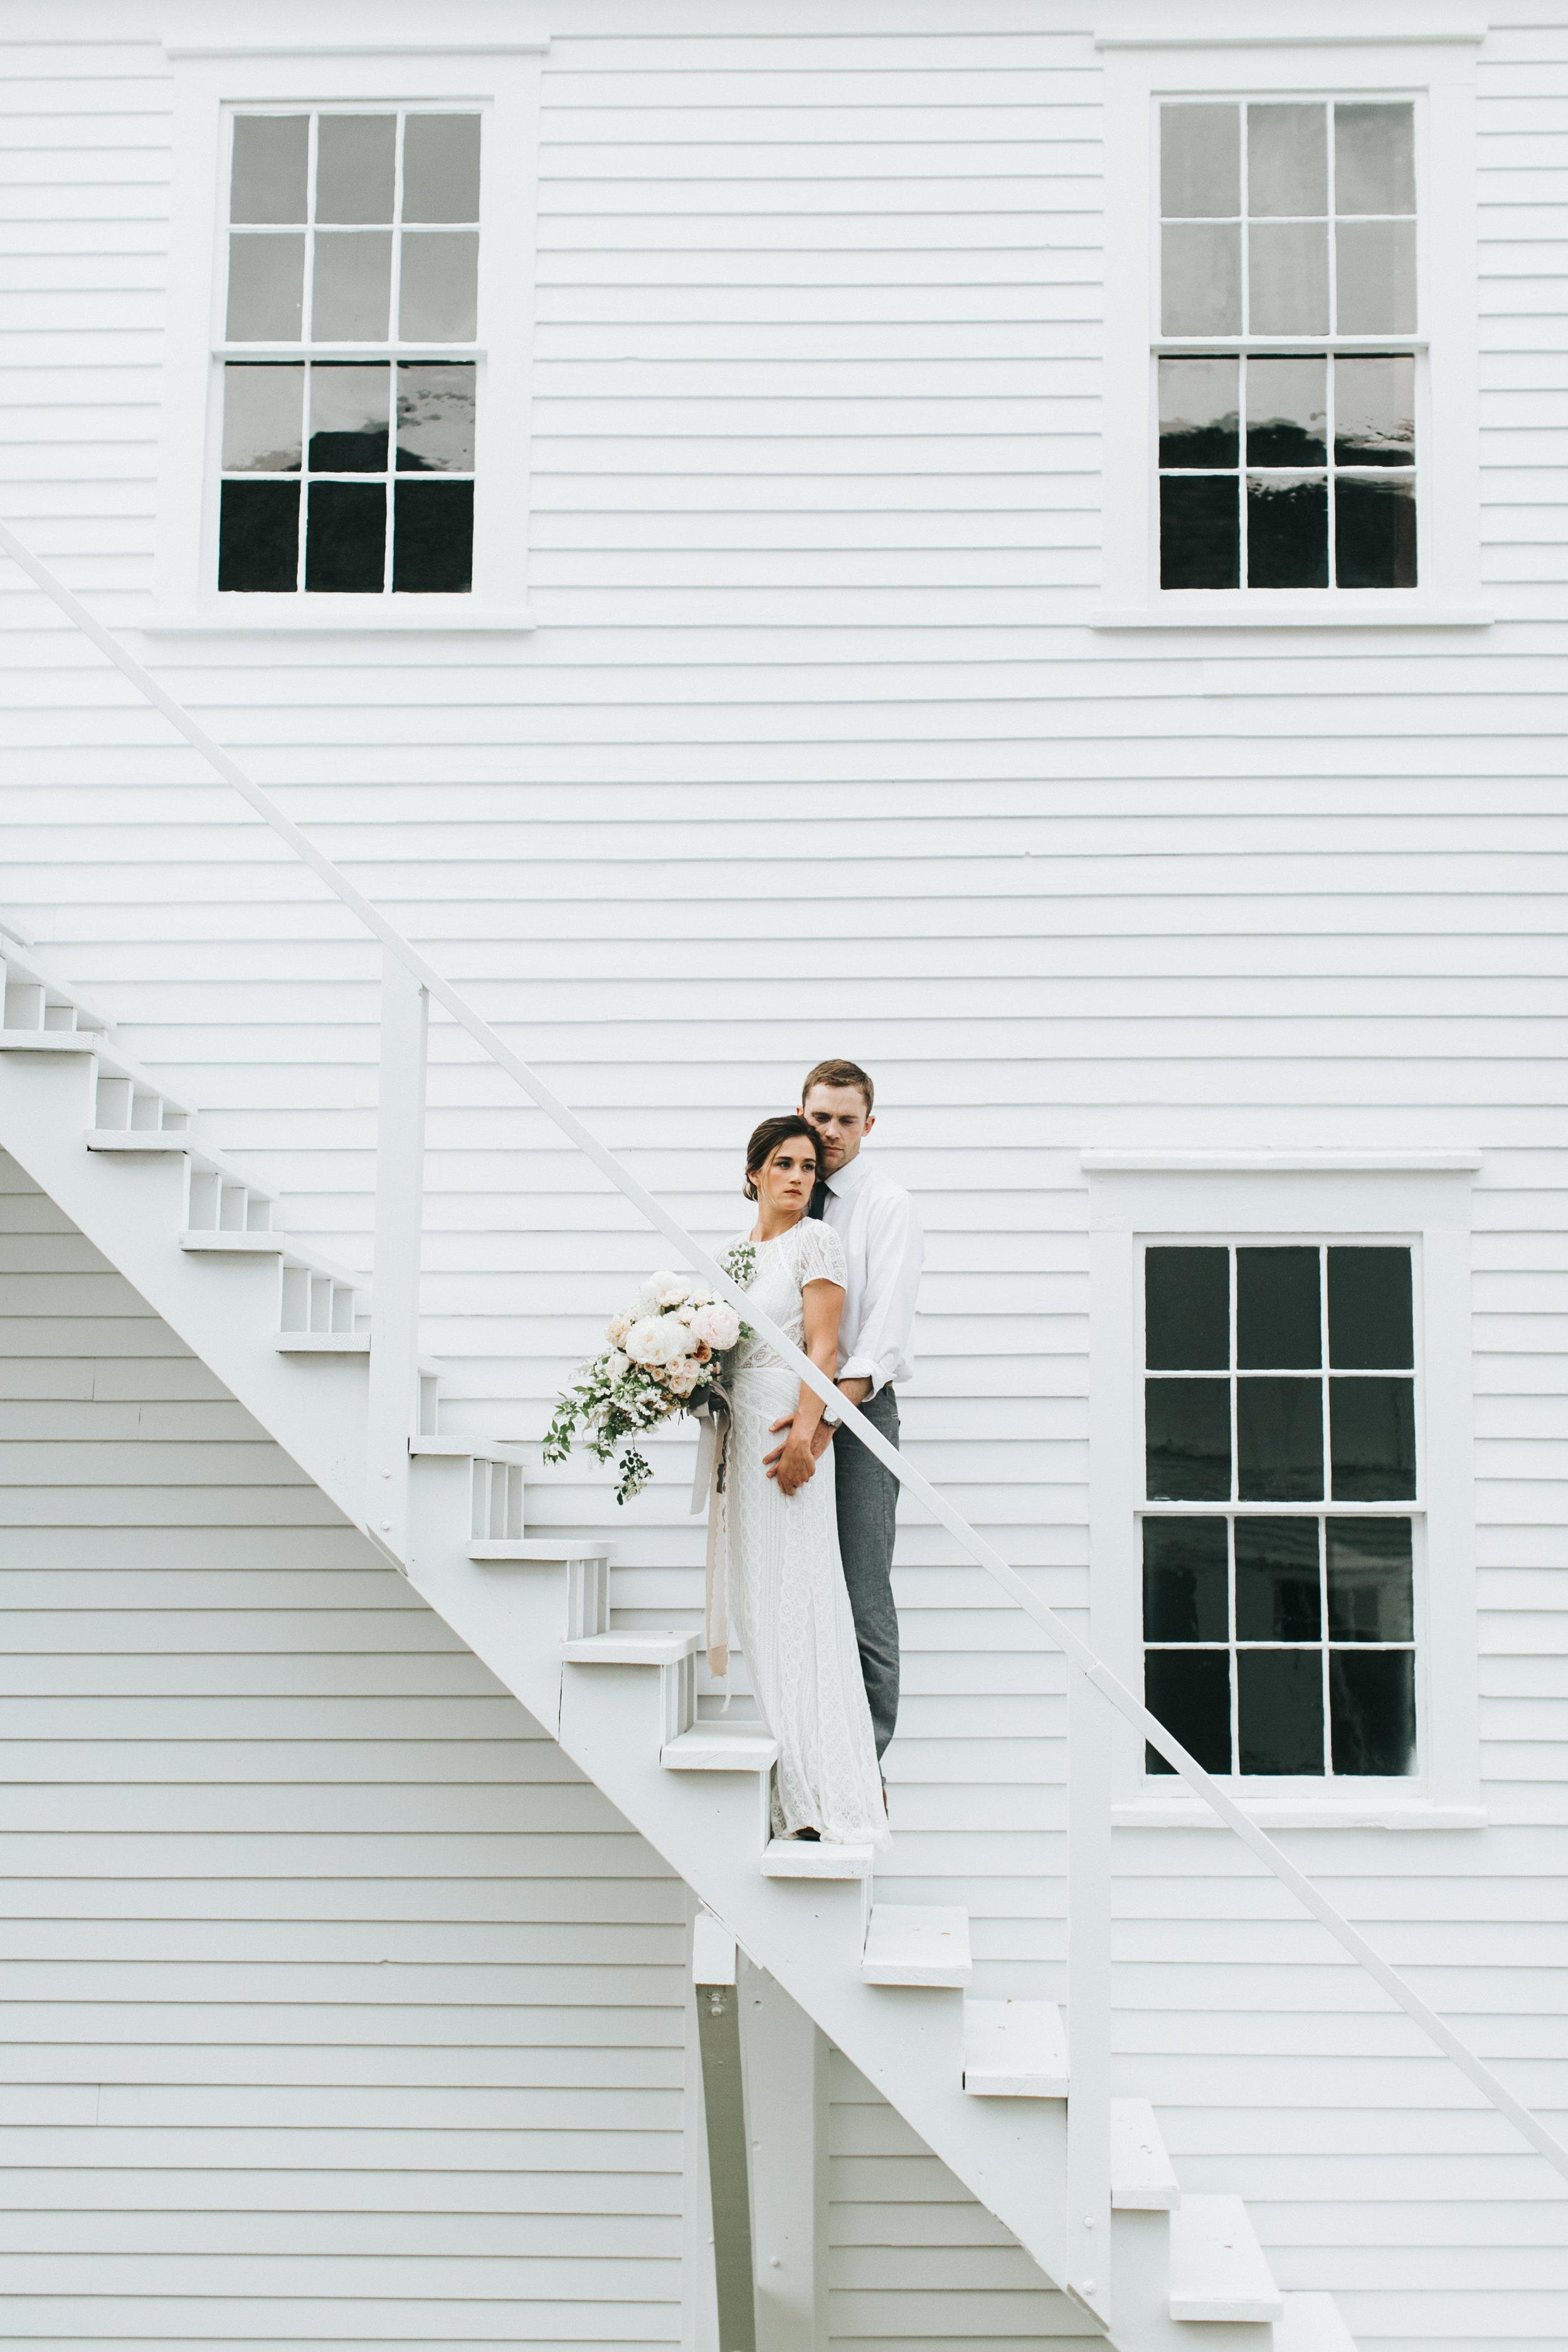 Watershed-Floral-Maine-Maritime-Wedding-Bridal-Bouquet-Centerpieces-0232.jpg